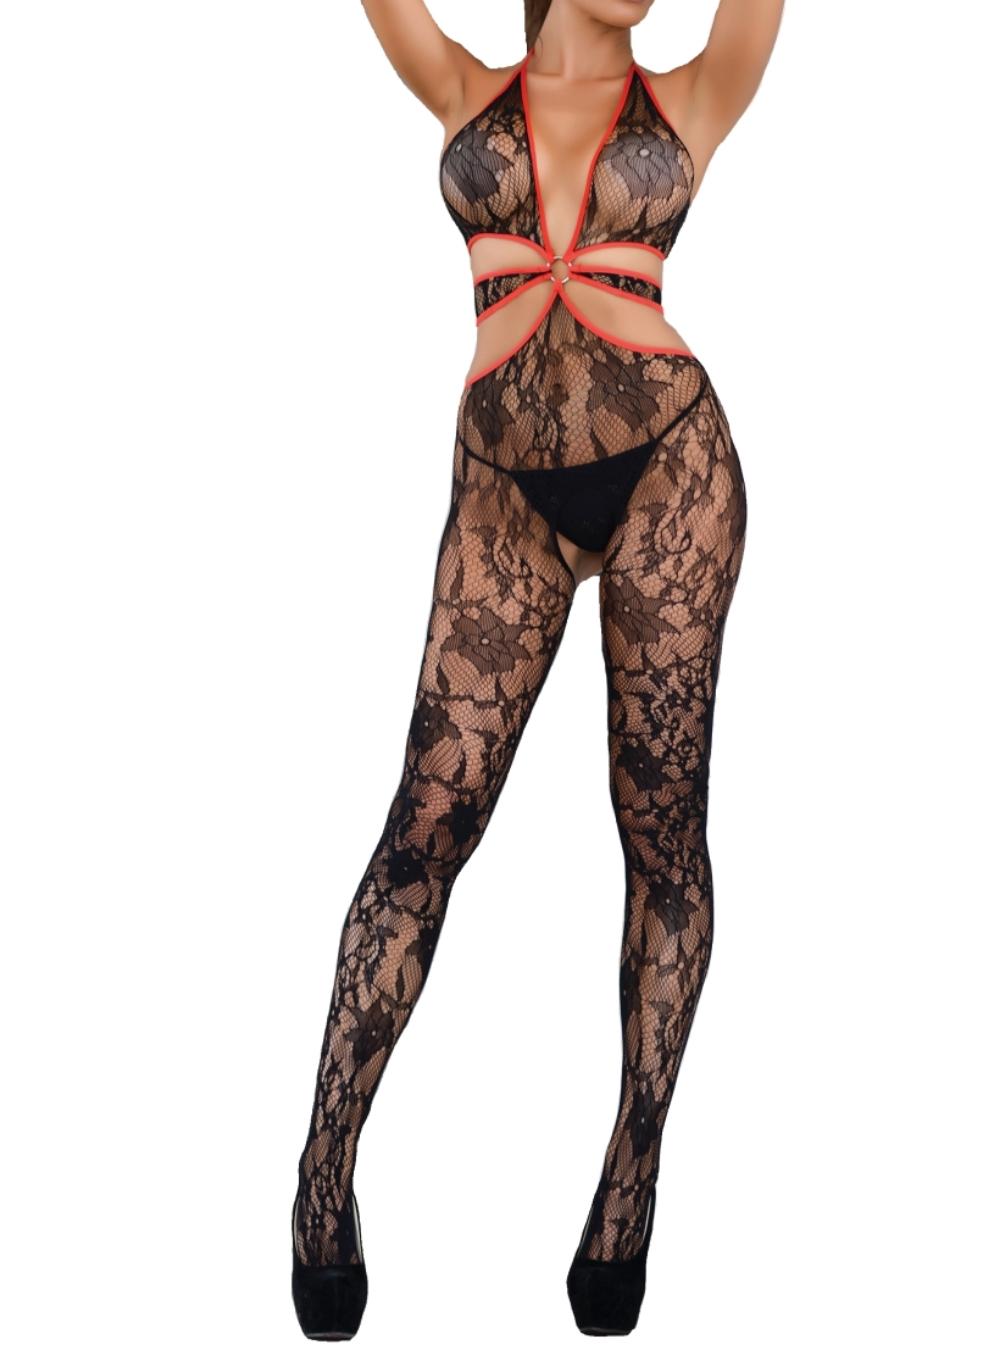 7e8e01b51f0 Killer Legs Fishnet Plus Size Halter Bra Red Satin Trim Lace Open Crotch  Crotchless Body Stocking 818JT158Q Queen